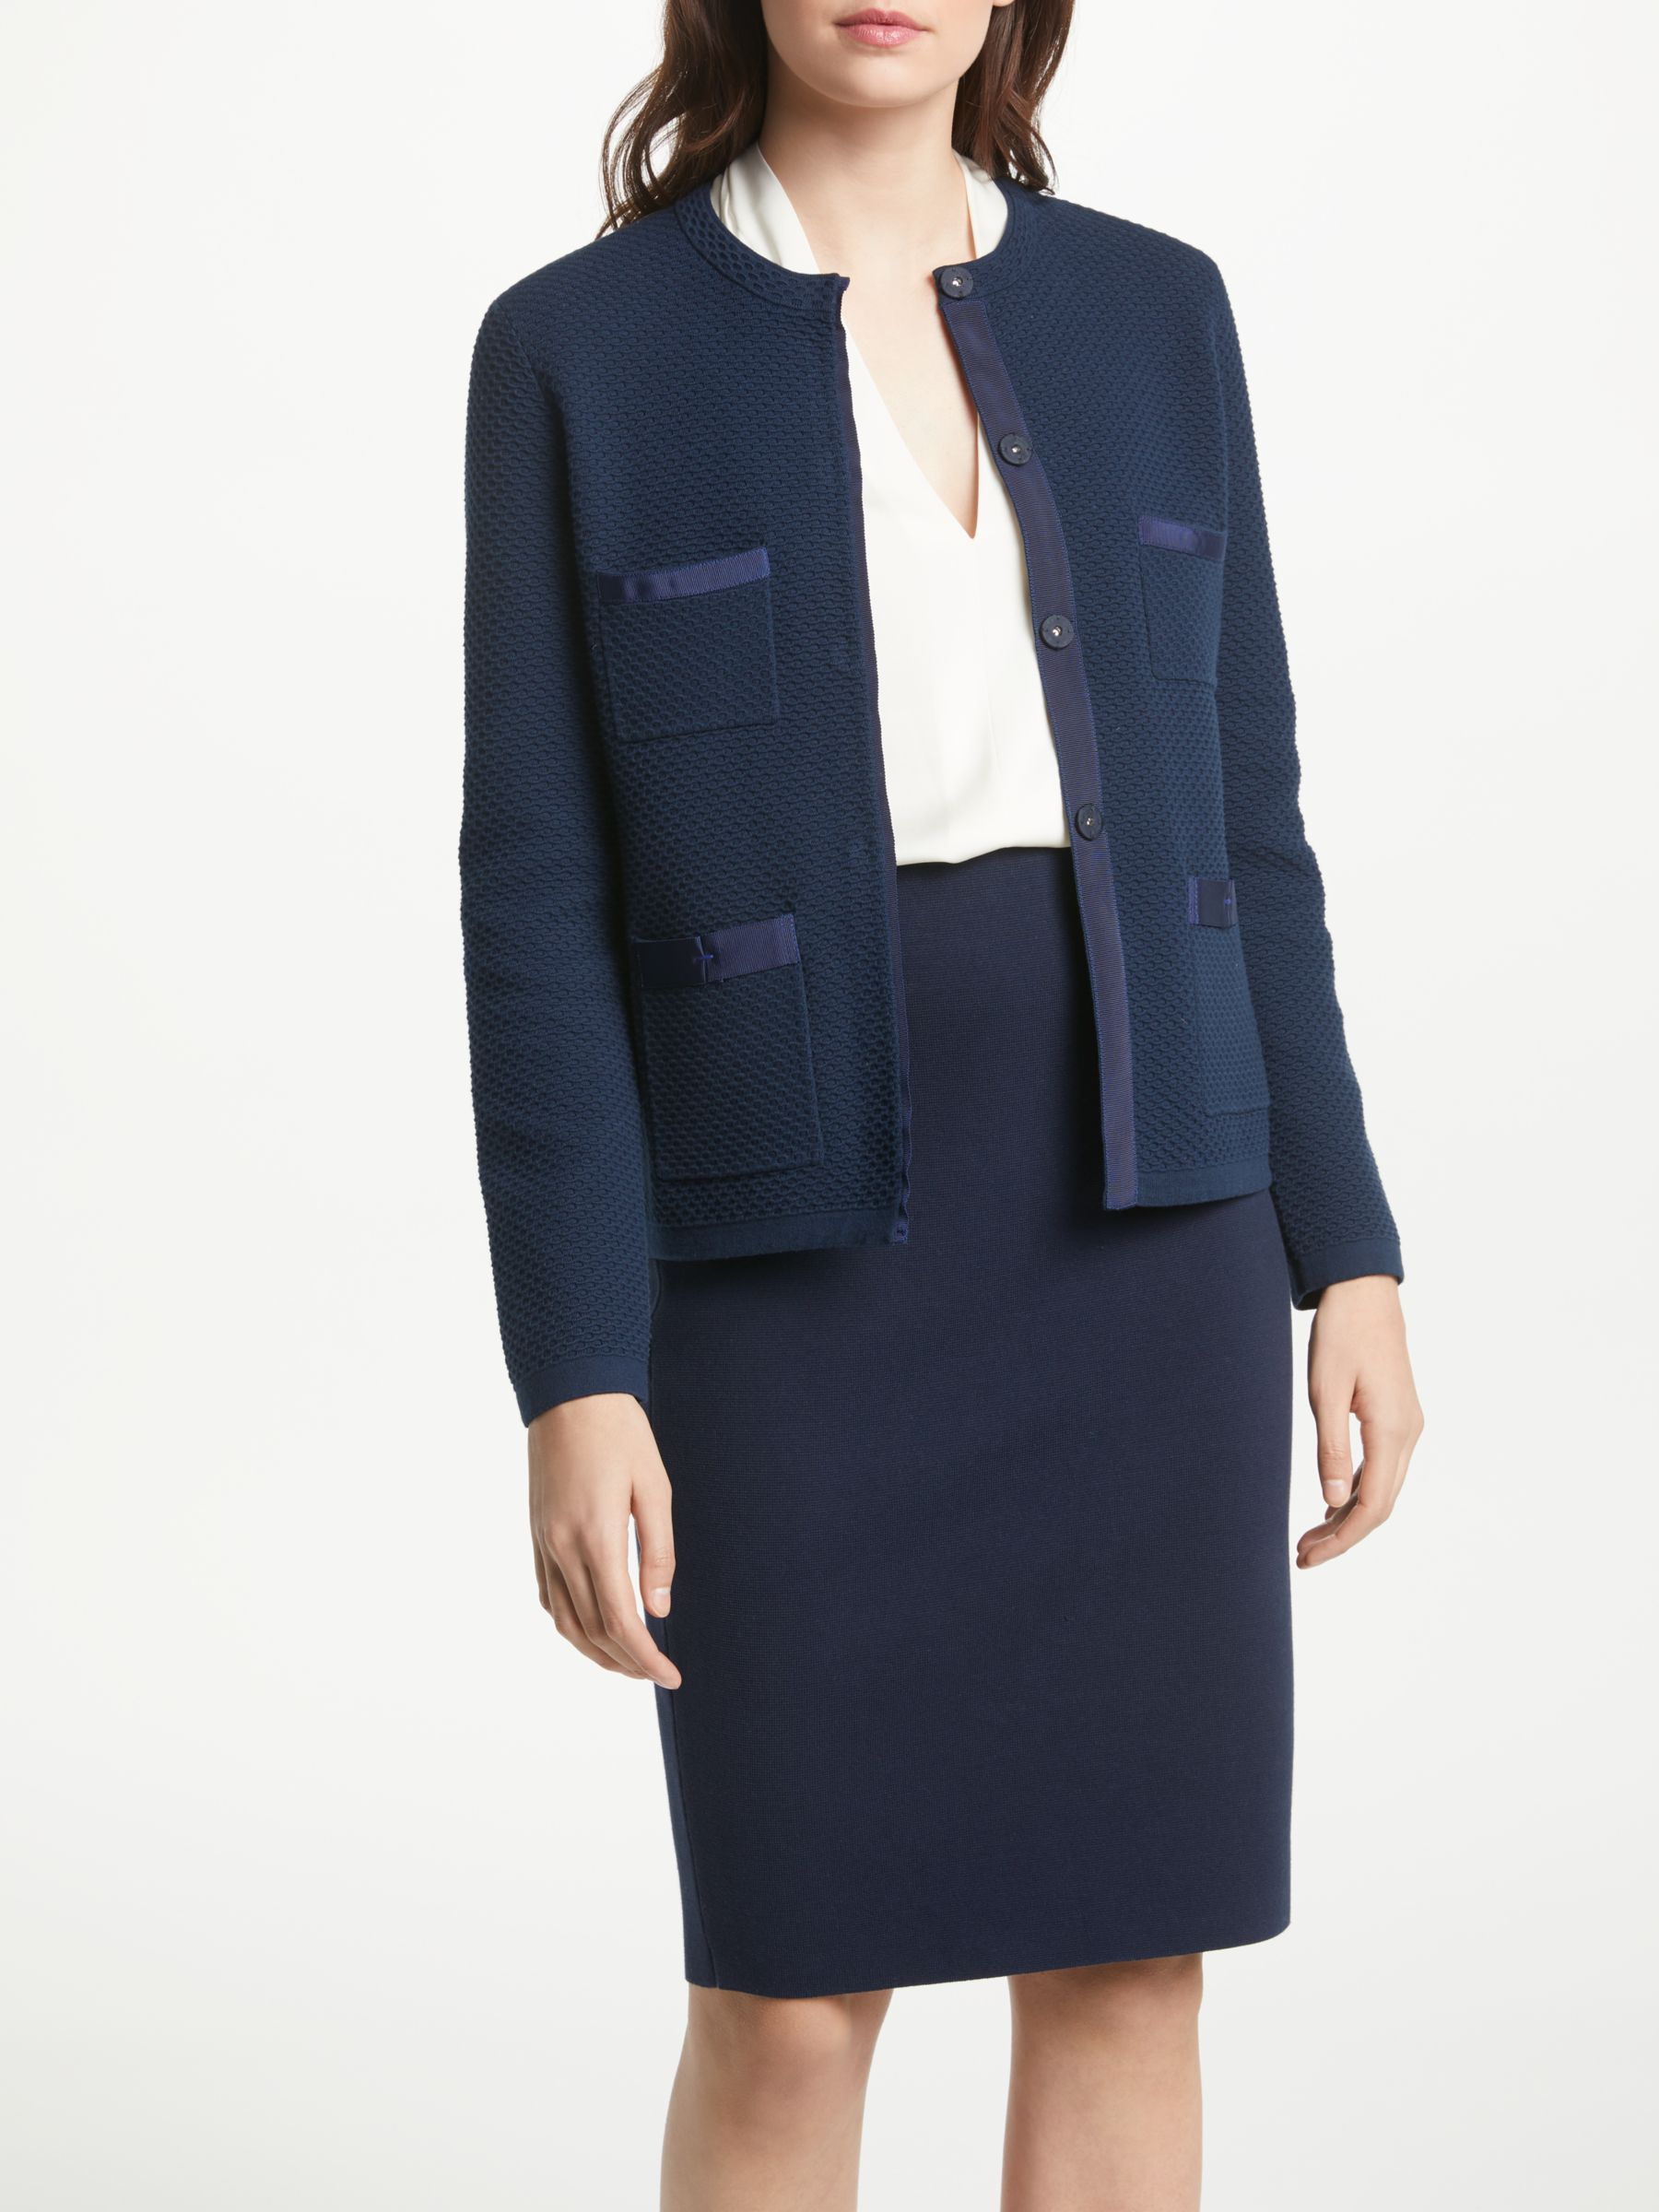 Winser London Winser London Cotton Parisian Jacket